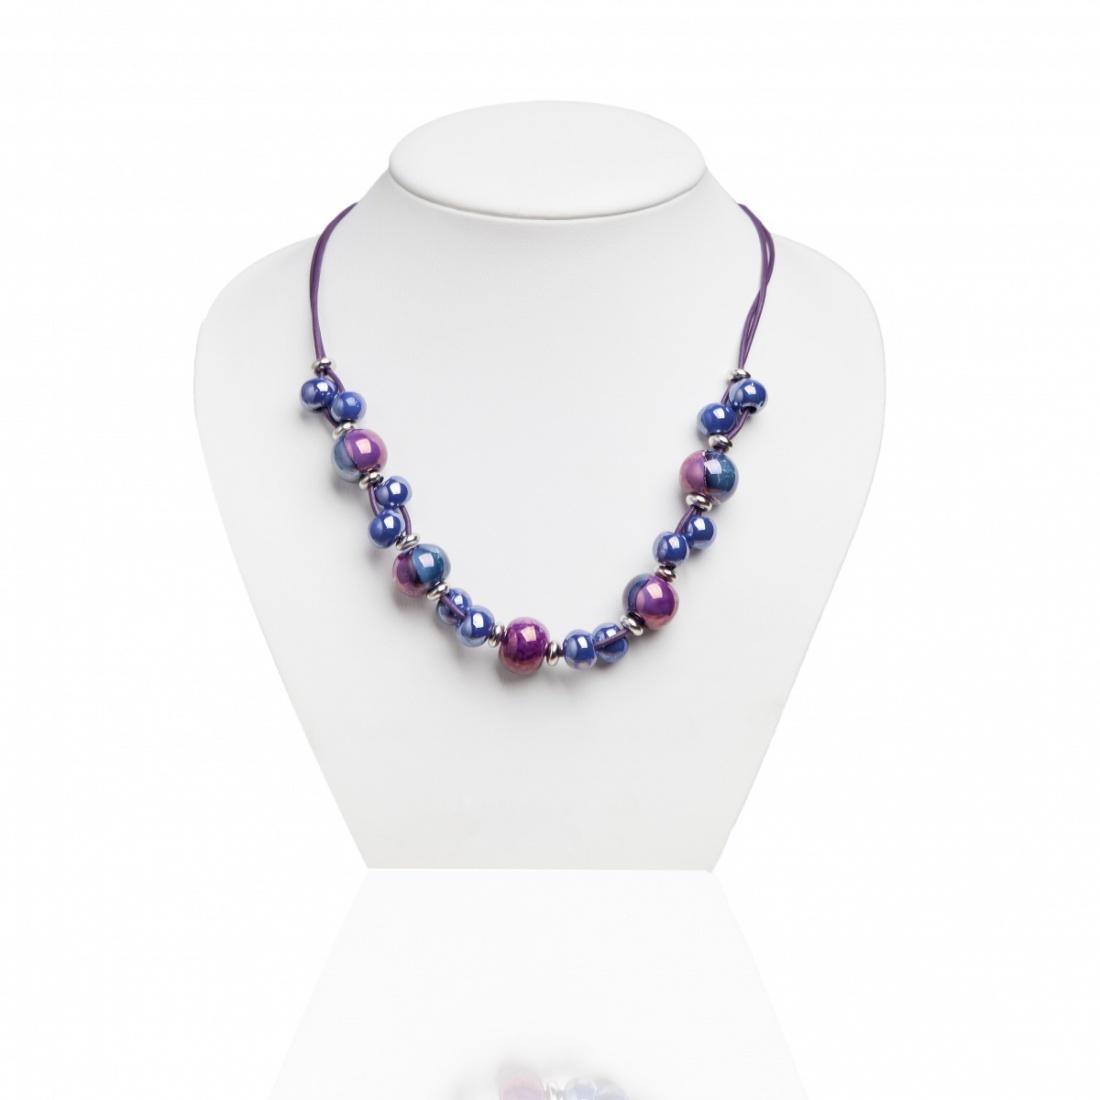 Колье/ожерелье бижутерное By Dziubeka аниме часы ожерелье бижутерия haoyunlian sao